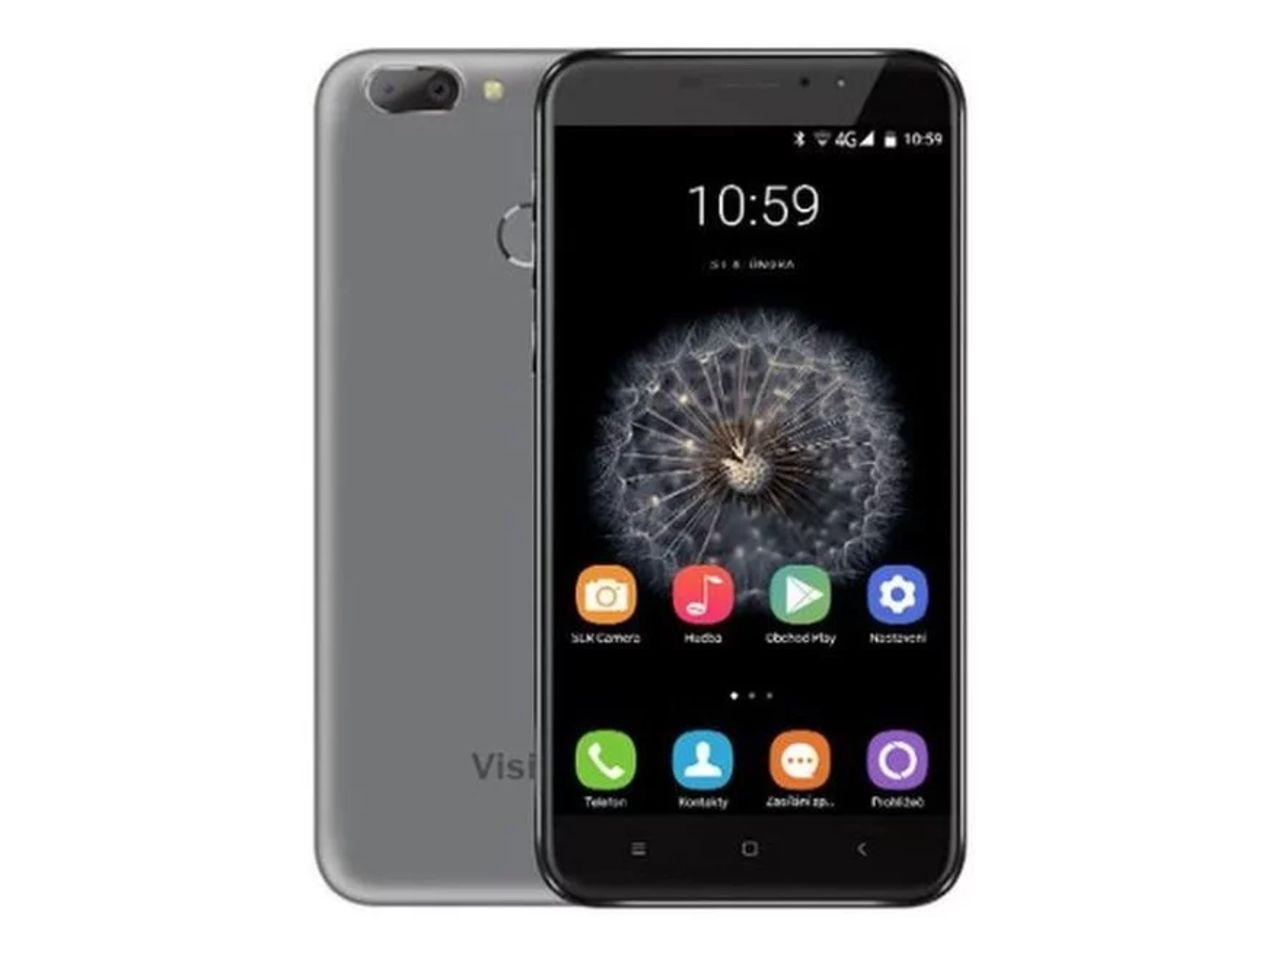 UMAX VisionBook P55 LTE Pro, 16 GB, Dual SIM, šedý, CZ distribuce | CHAT on-line podpora PO-PÁ 8-22.00!!